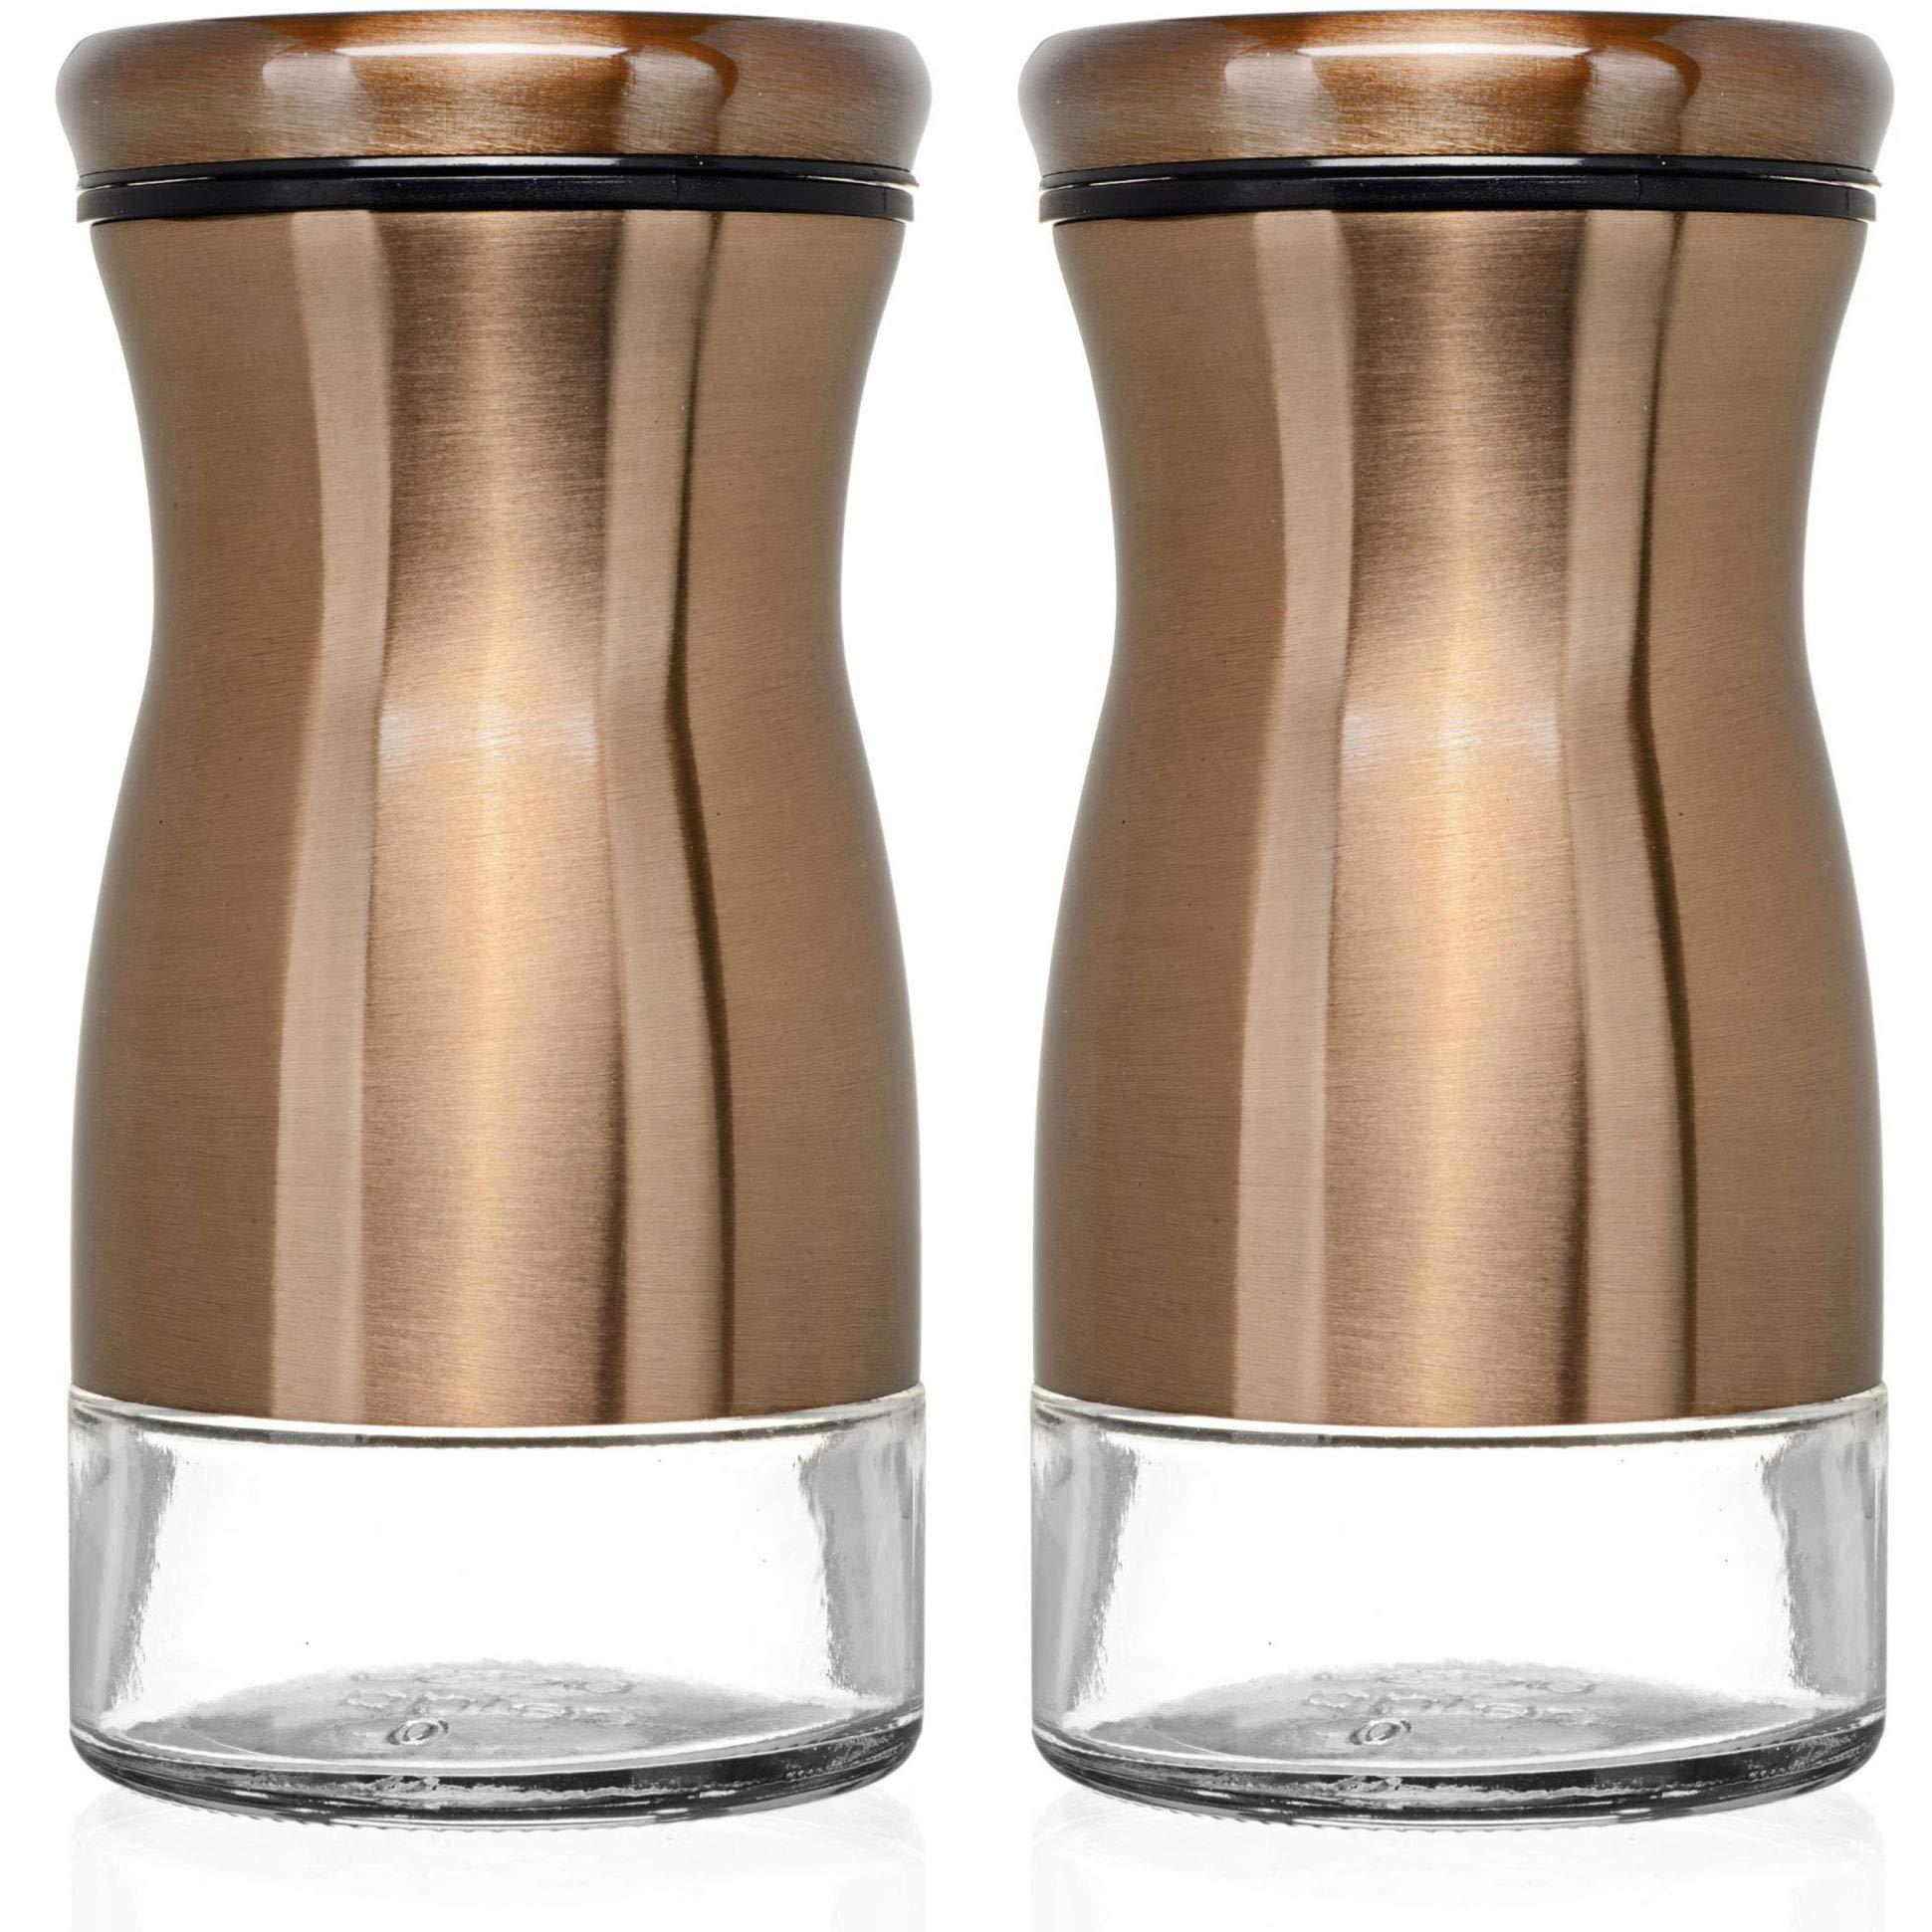 CHEFVANTAGE Salt and Pepper Shakers Set with Adjustable Pour Holes - Bronze by CHEFVANTAGE